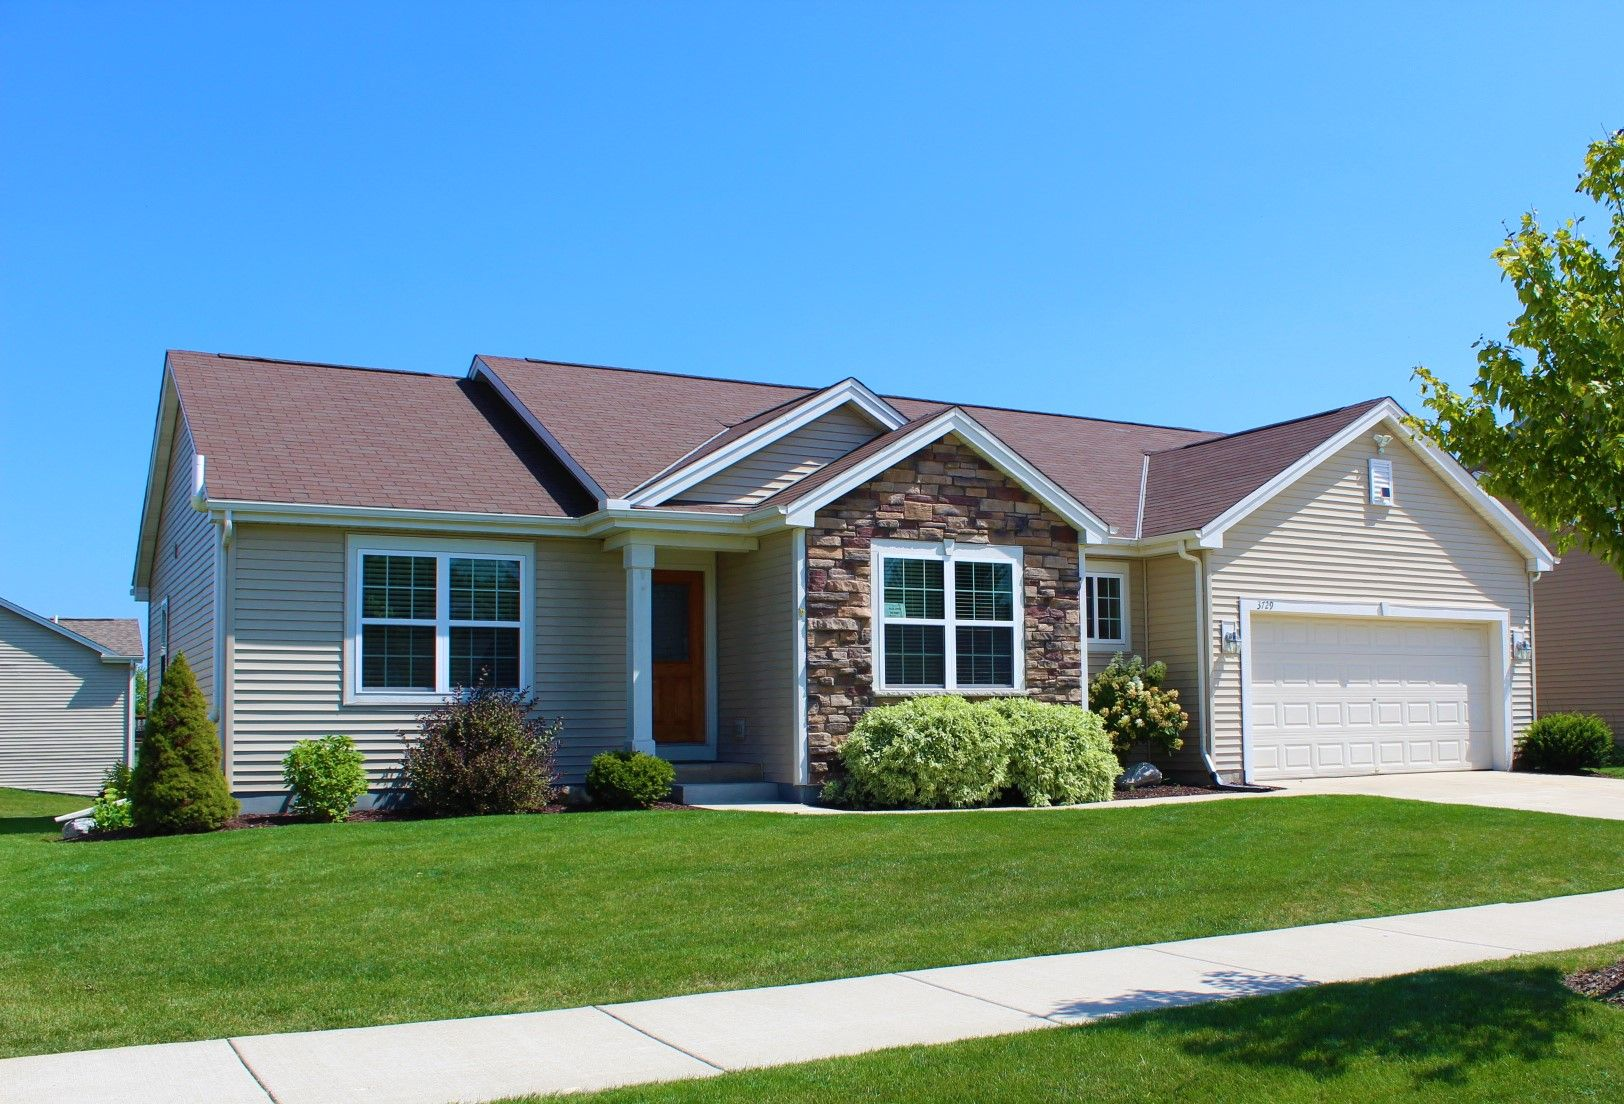 3729 95th Pl, Sturtevant, WI 53177 - 4 Bed, 3 Bath Single-Family Home - MLS  #1642727 - 24 Photos   Trulia